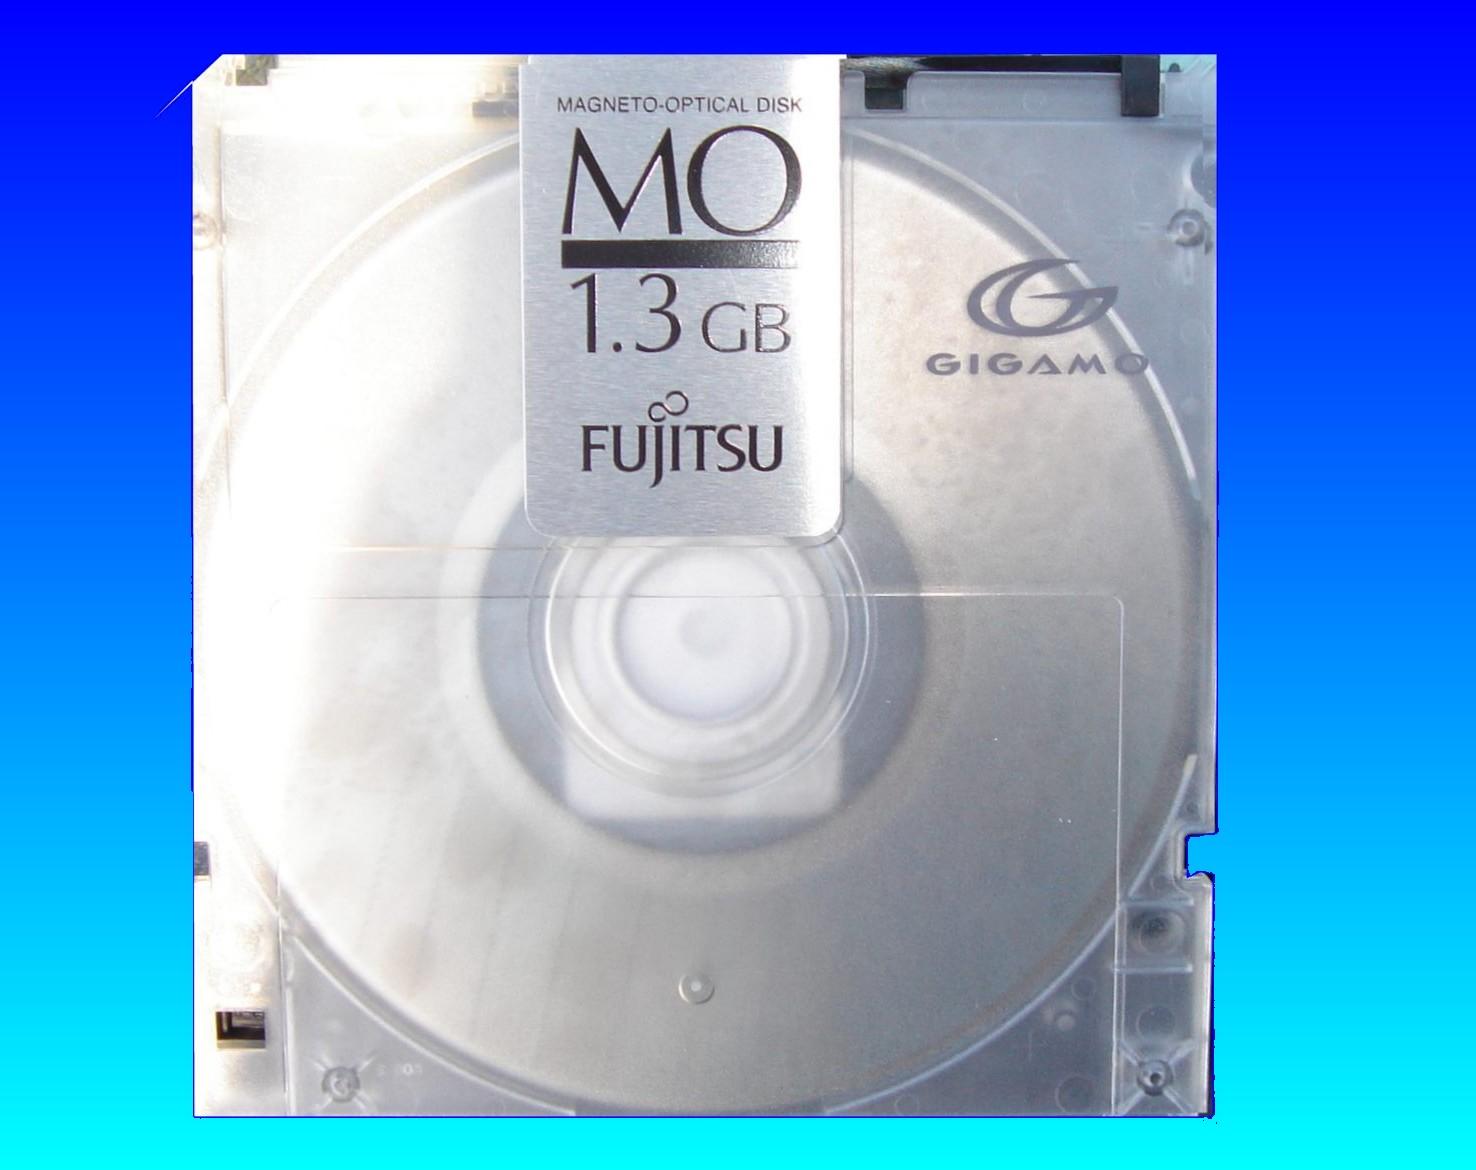 A Fujitsu Gigamo disk